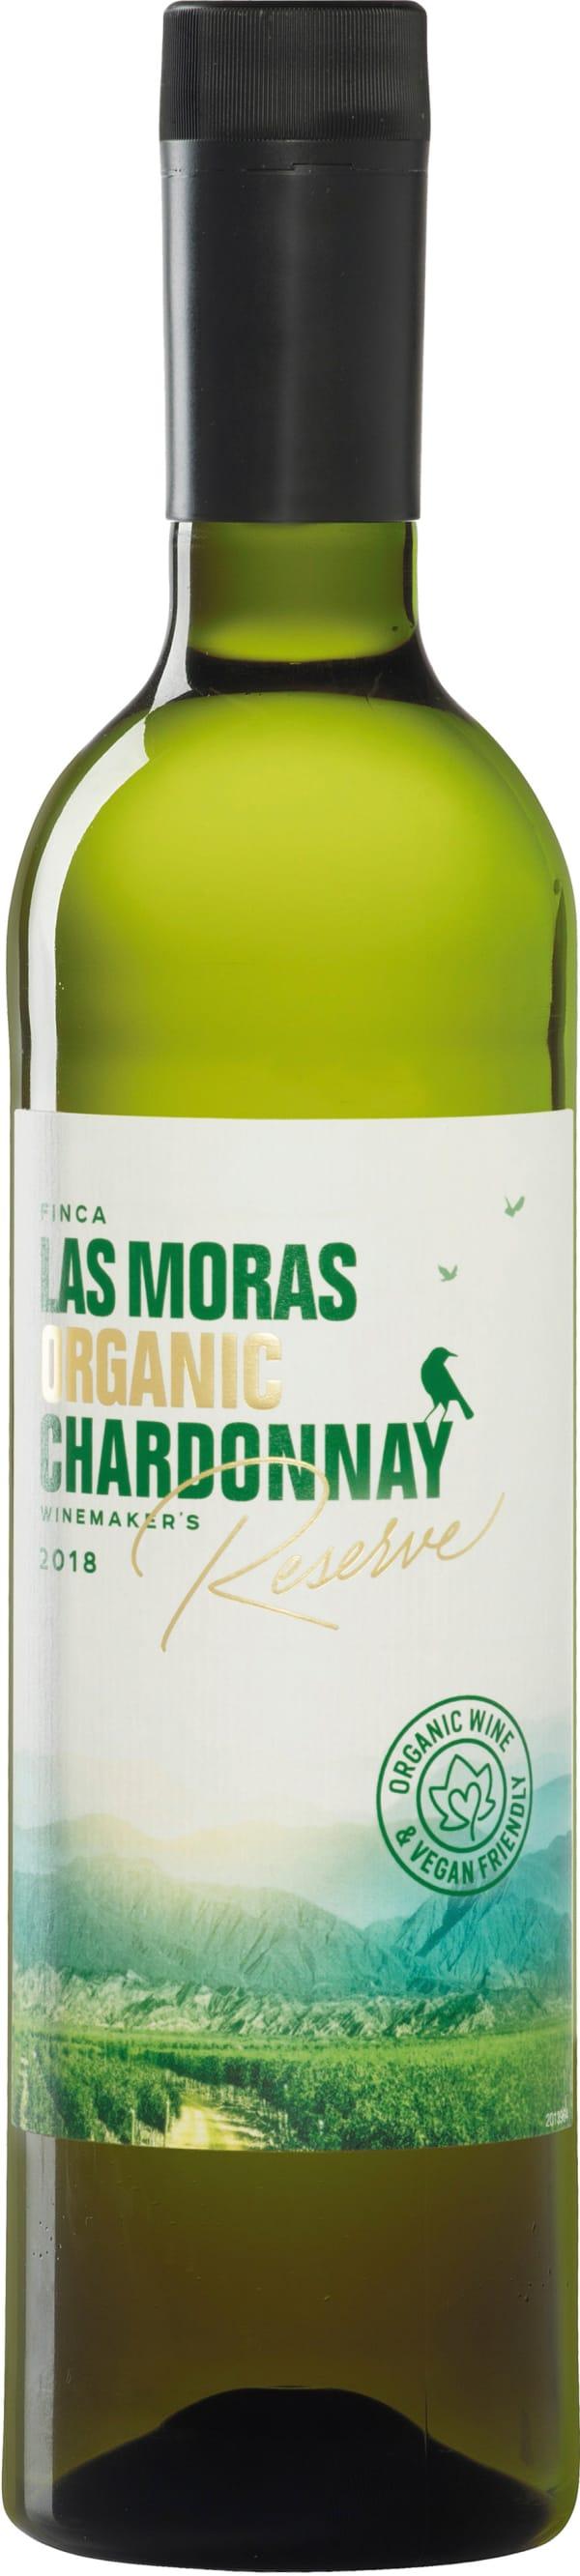 Finca Las Moras Organico Reserve Chardonnay 2018 muovipullo